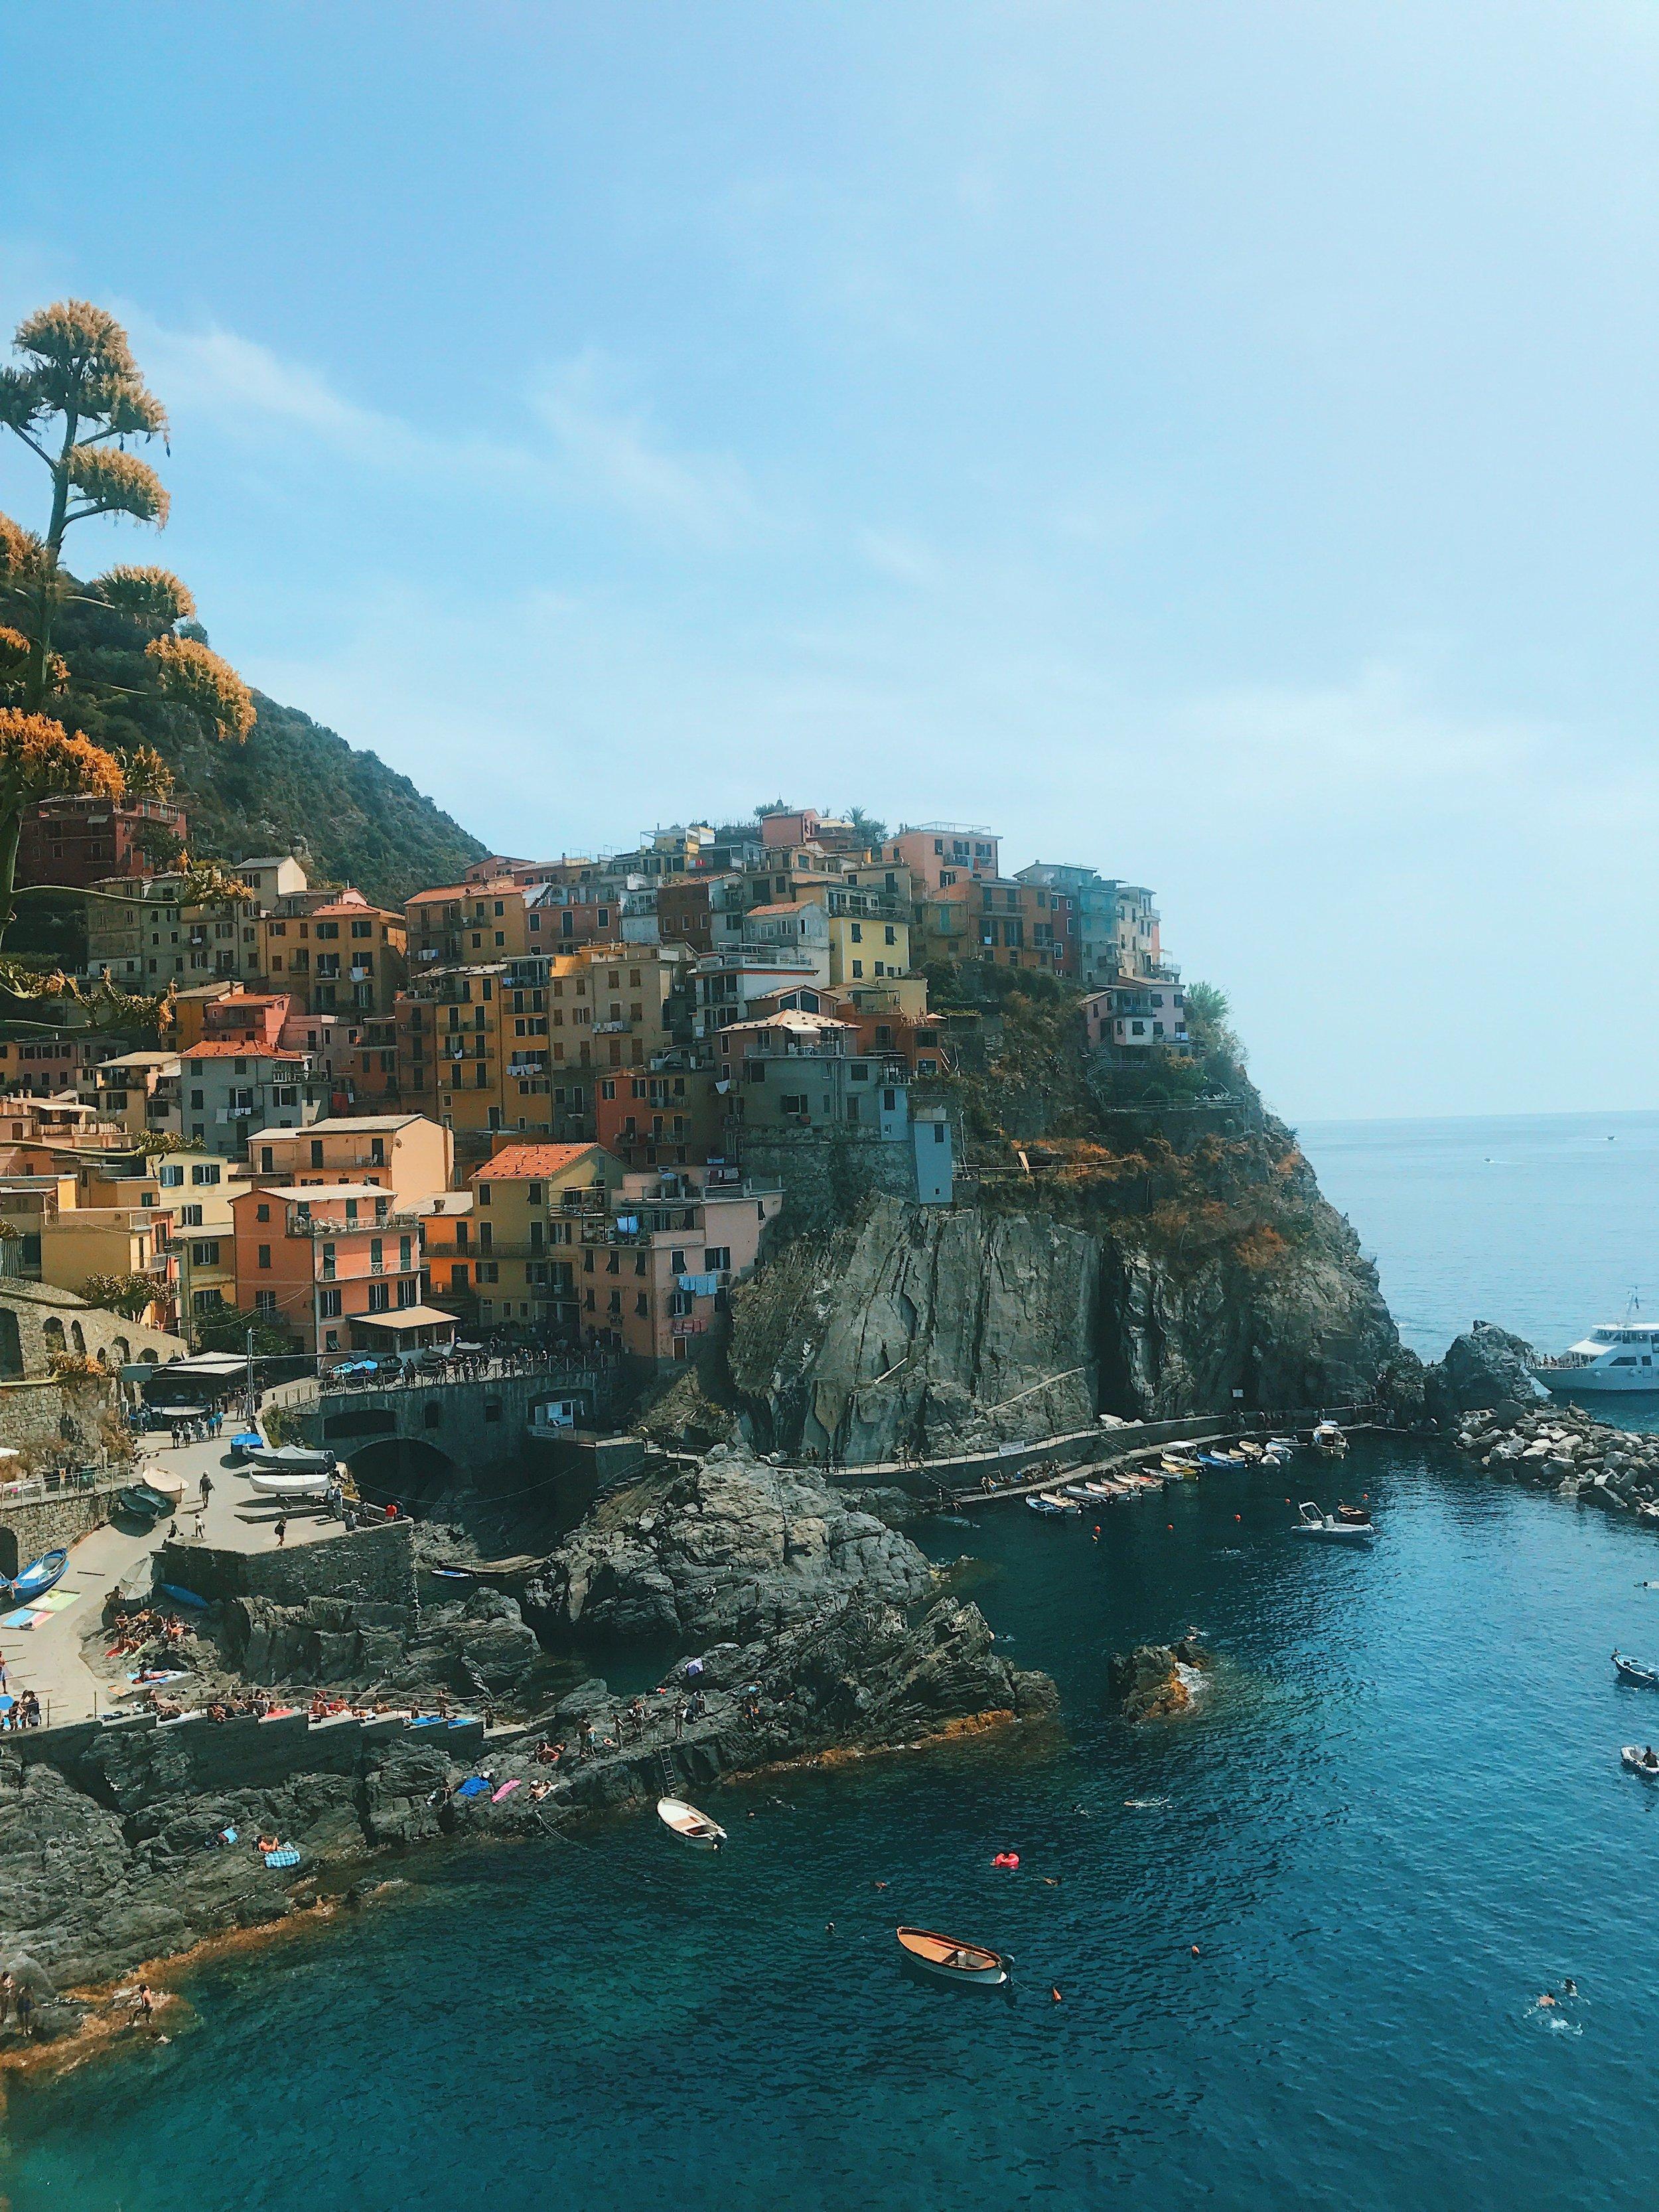 Manarola - Cinque Terre - Italy - Jessica Withey - Travel Blog